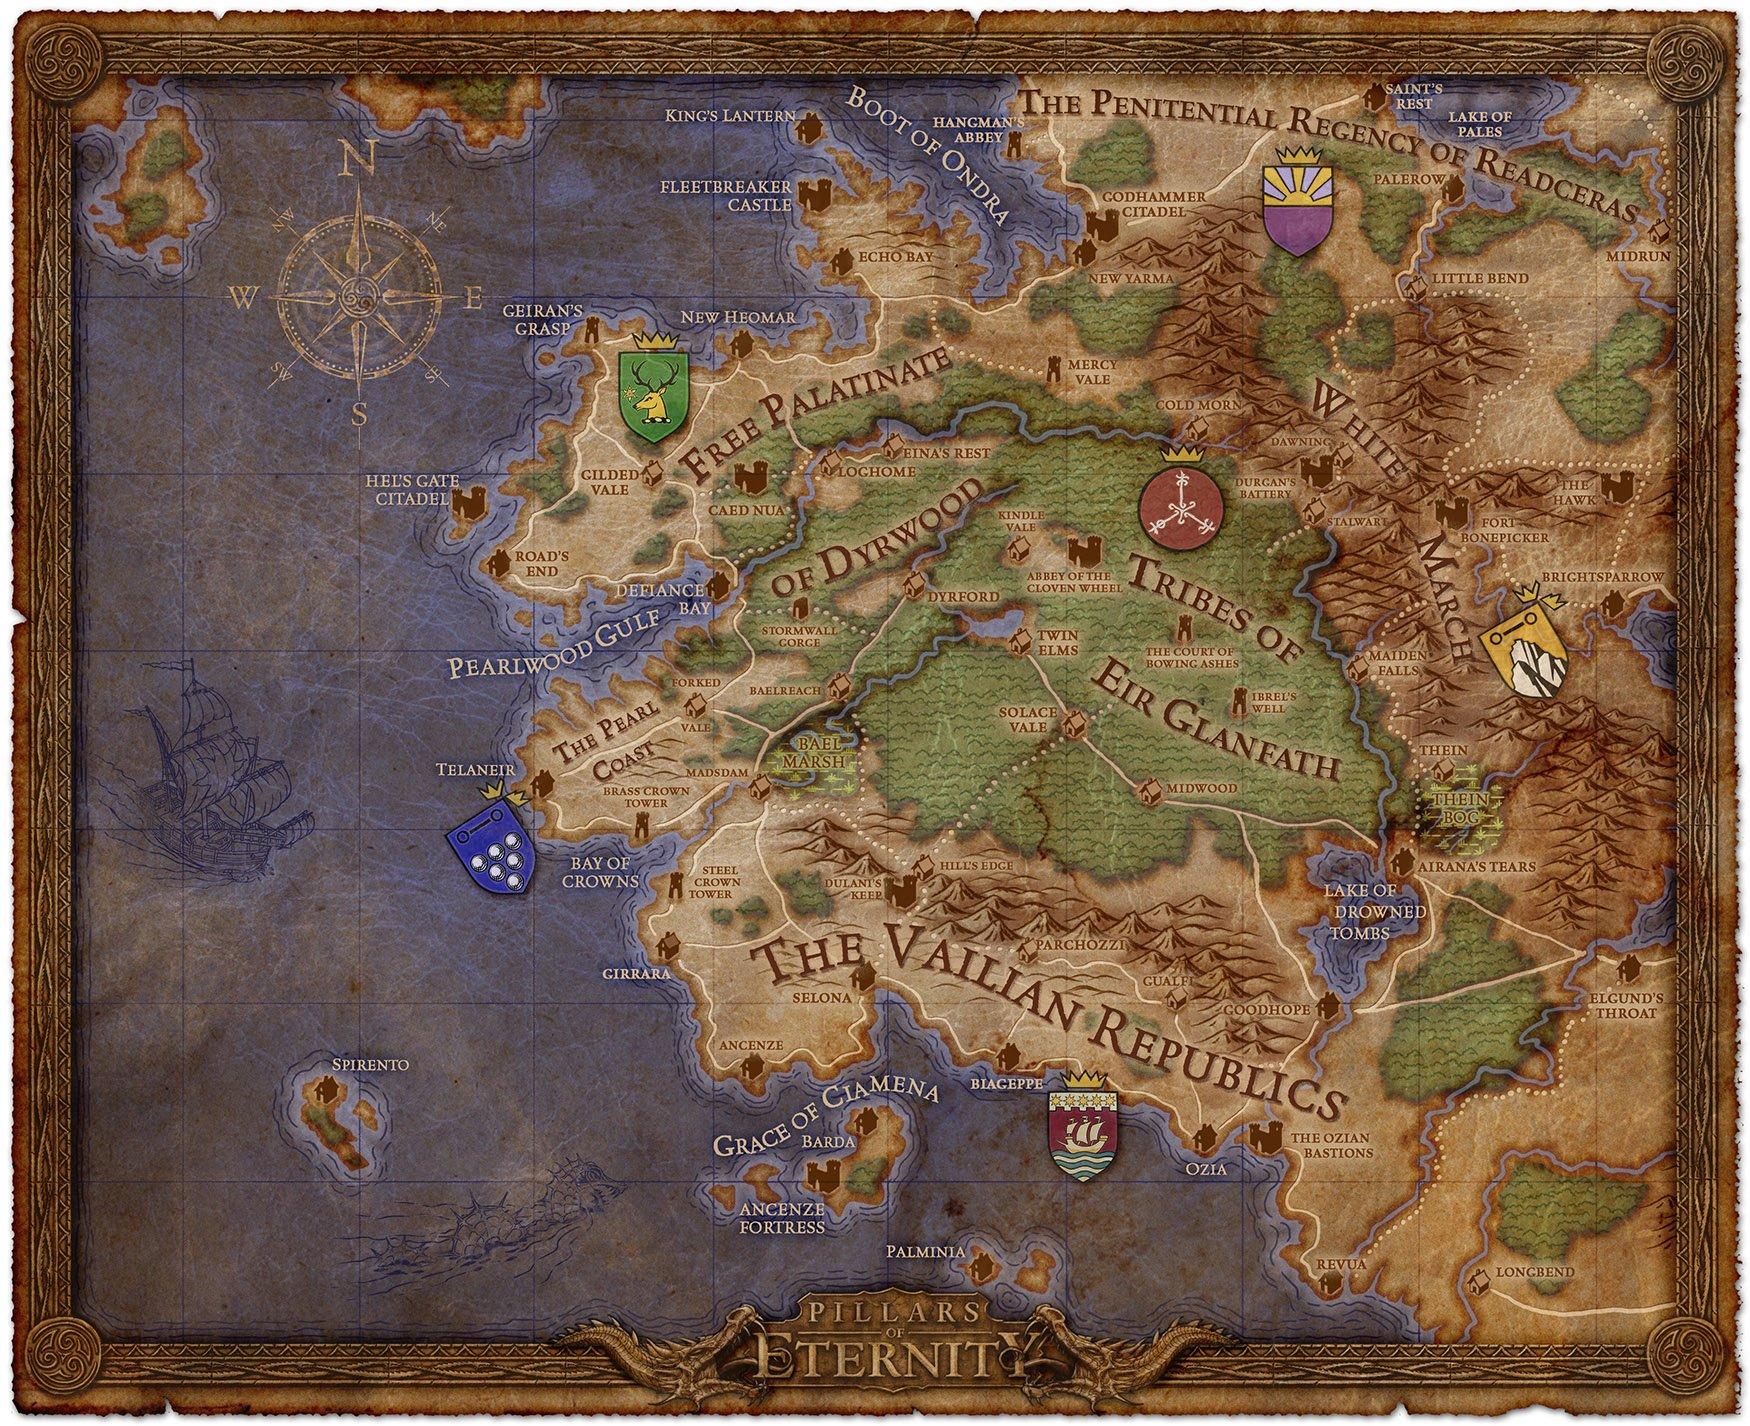 The world of Eora in Pillars of Eternity.